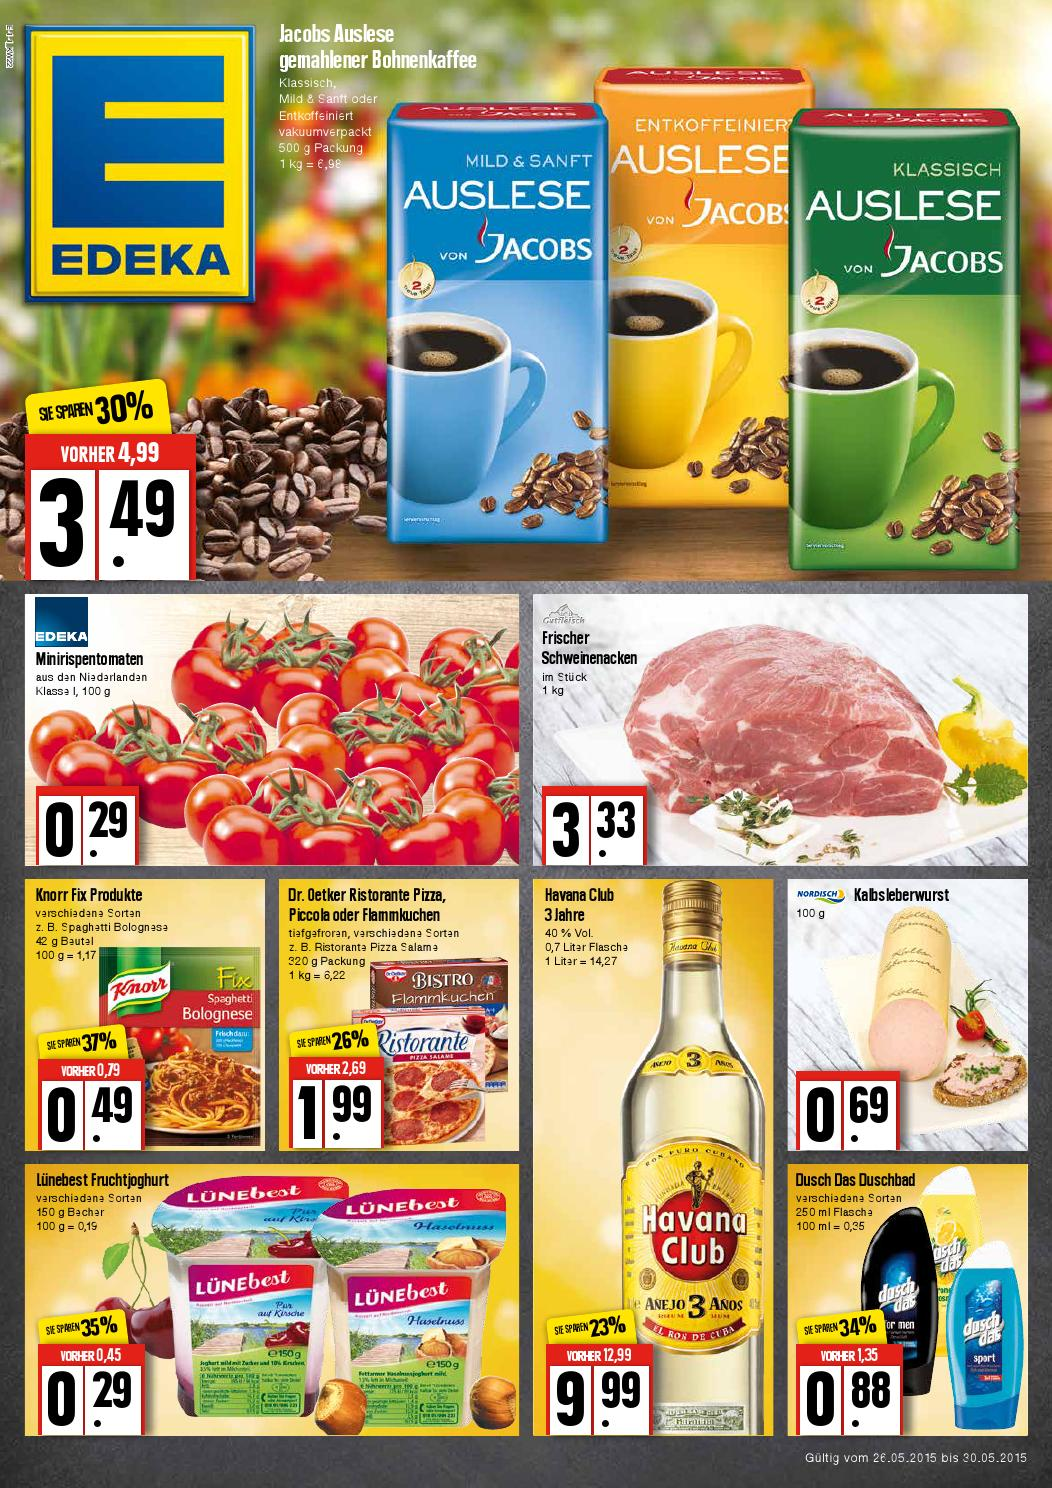 Edeka Angebote ab 26.05.15 - Onlineprospekt.com by Onlineprospekt ...